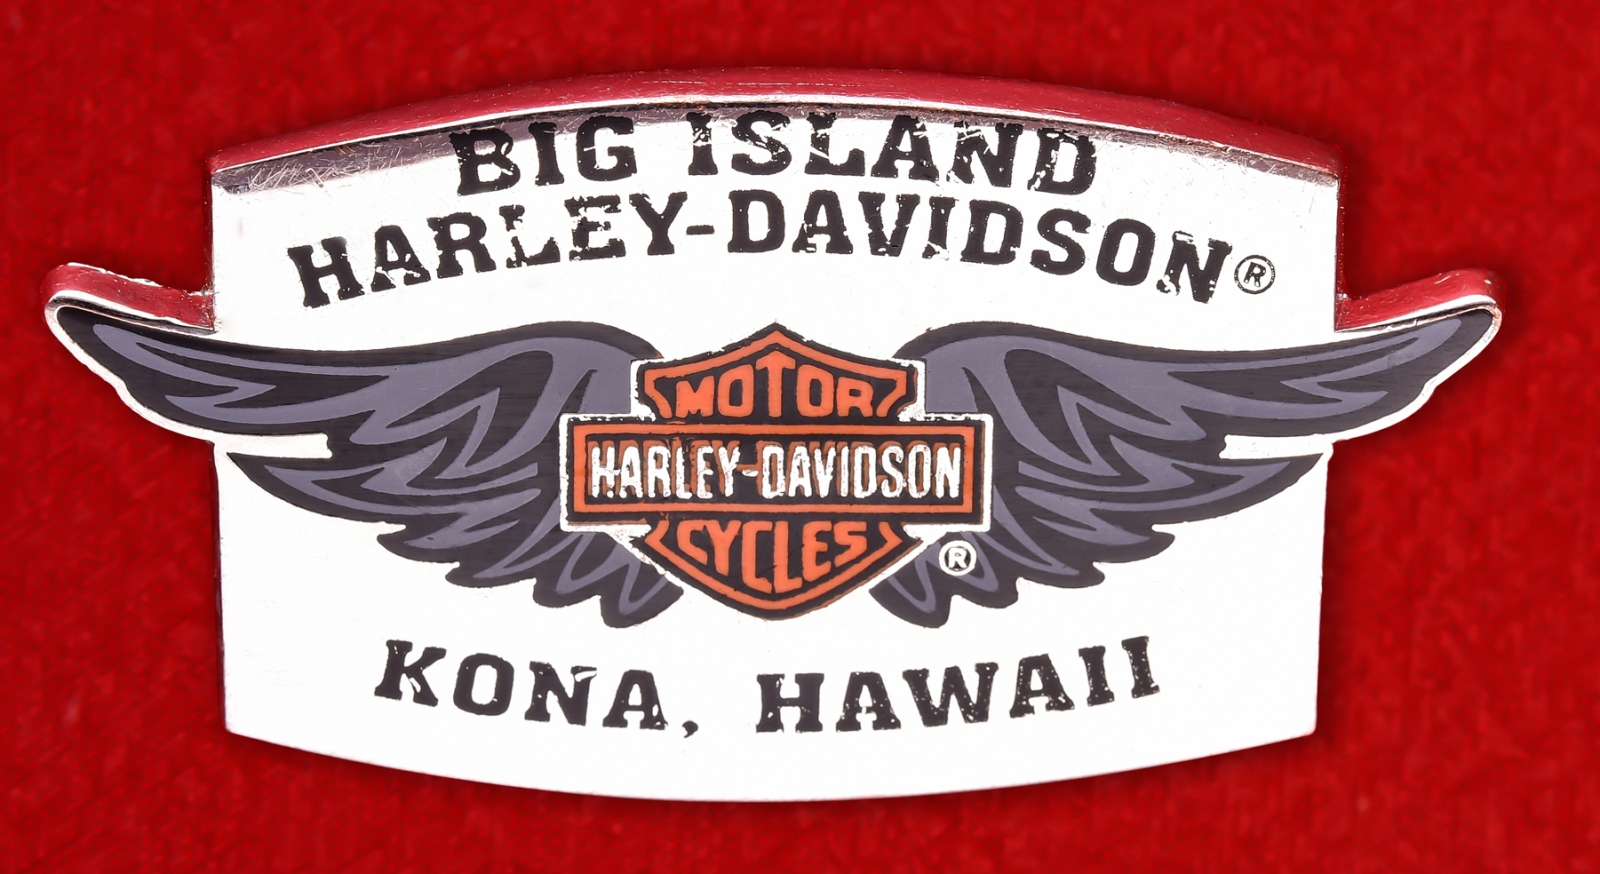 "Значок байкеров США ""Харлей-Дэвидсон, Кона, Гавайи"""